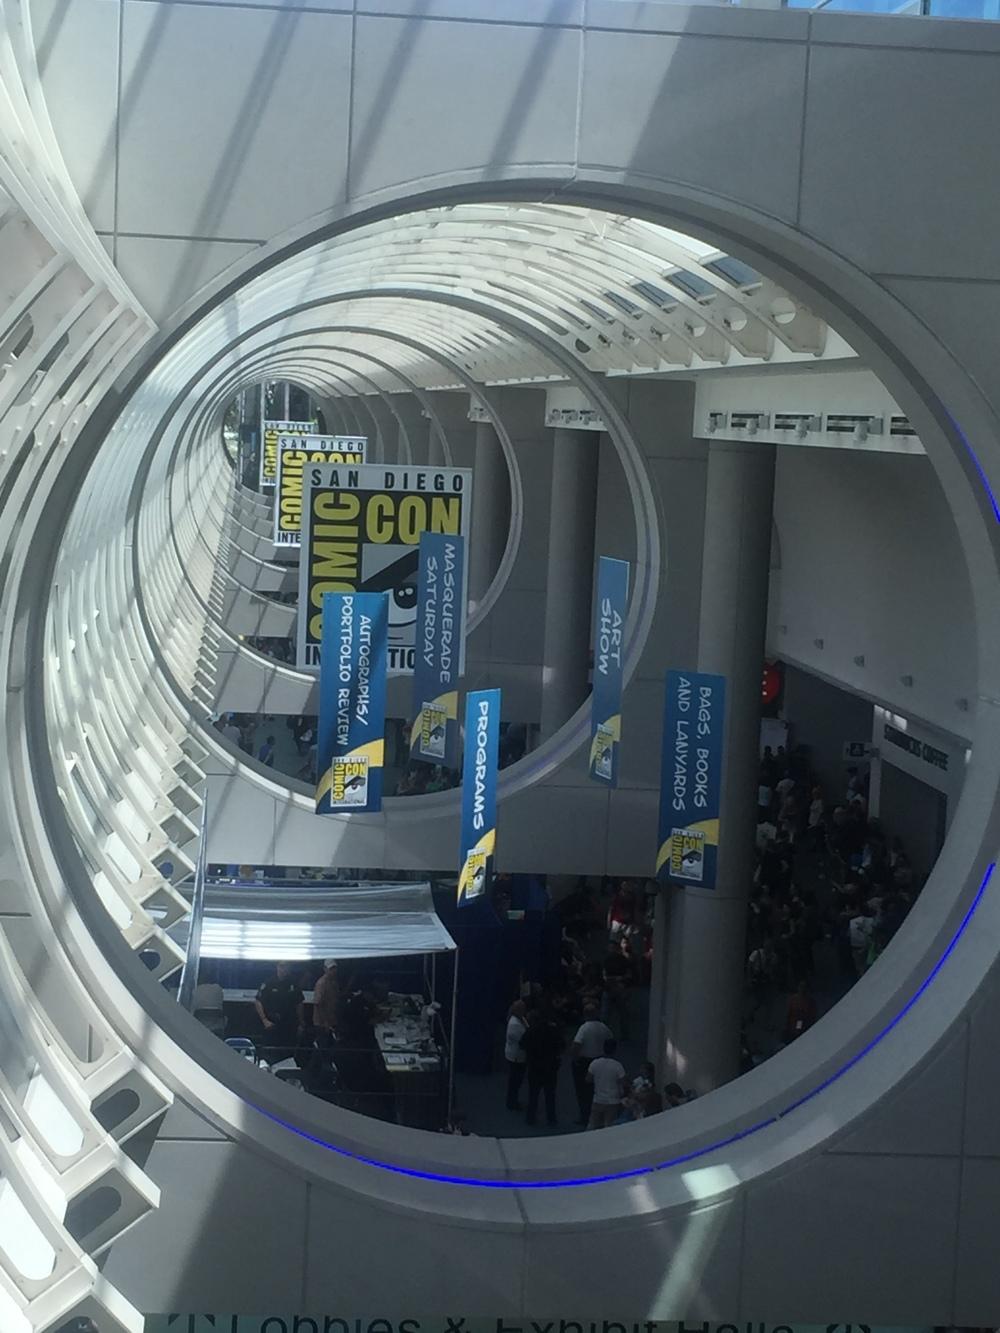 Comic-Con Hallway